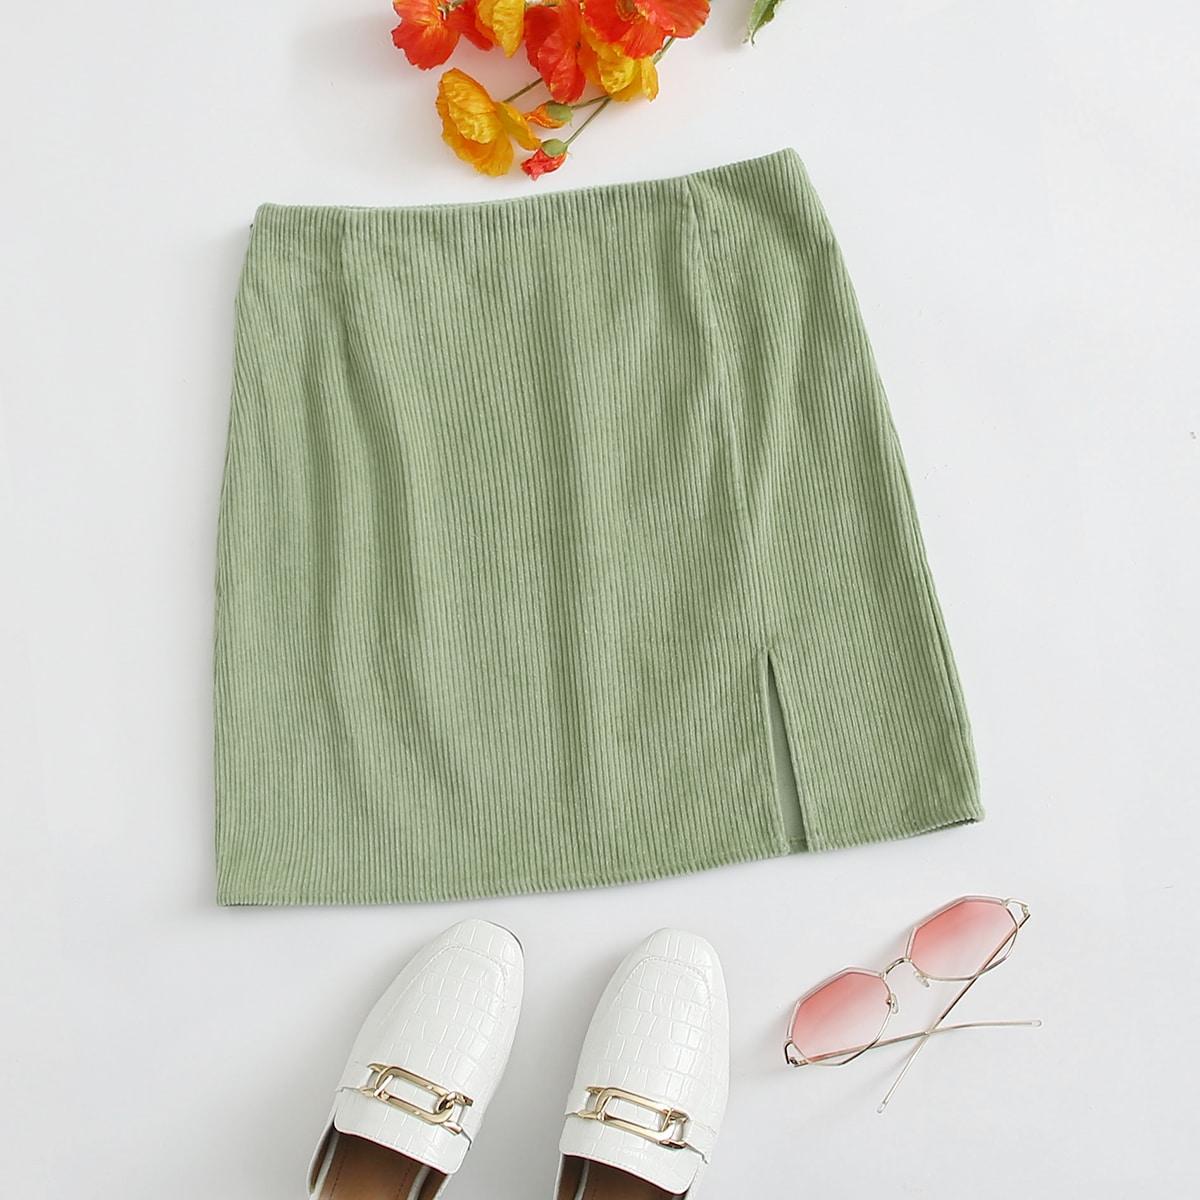 SHEIN / Split Hem Cord Skirt